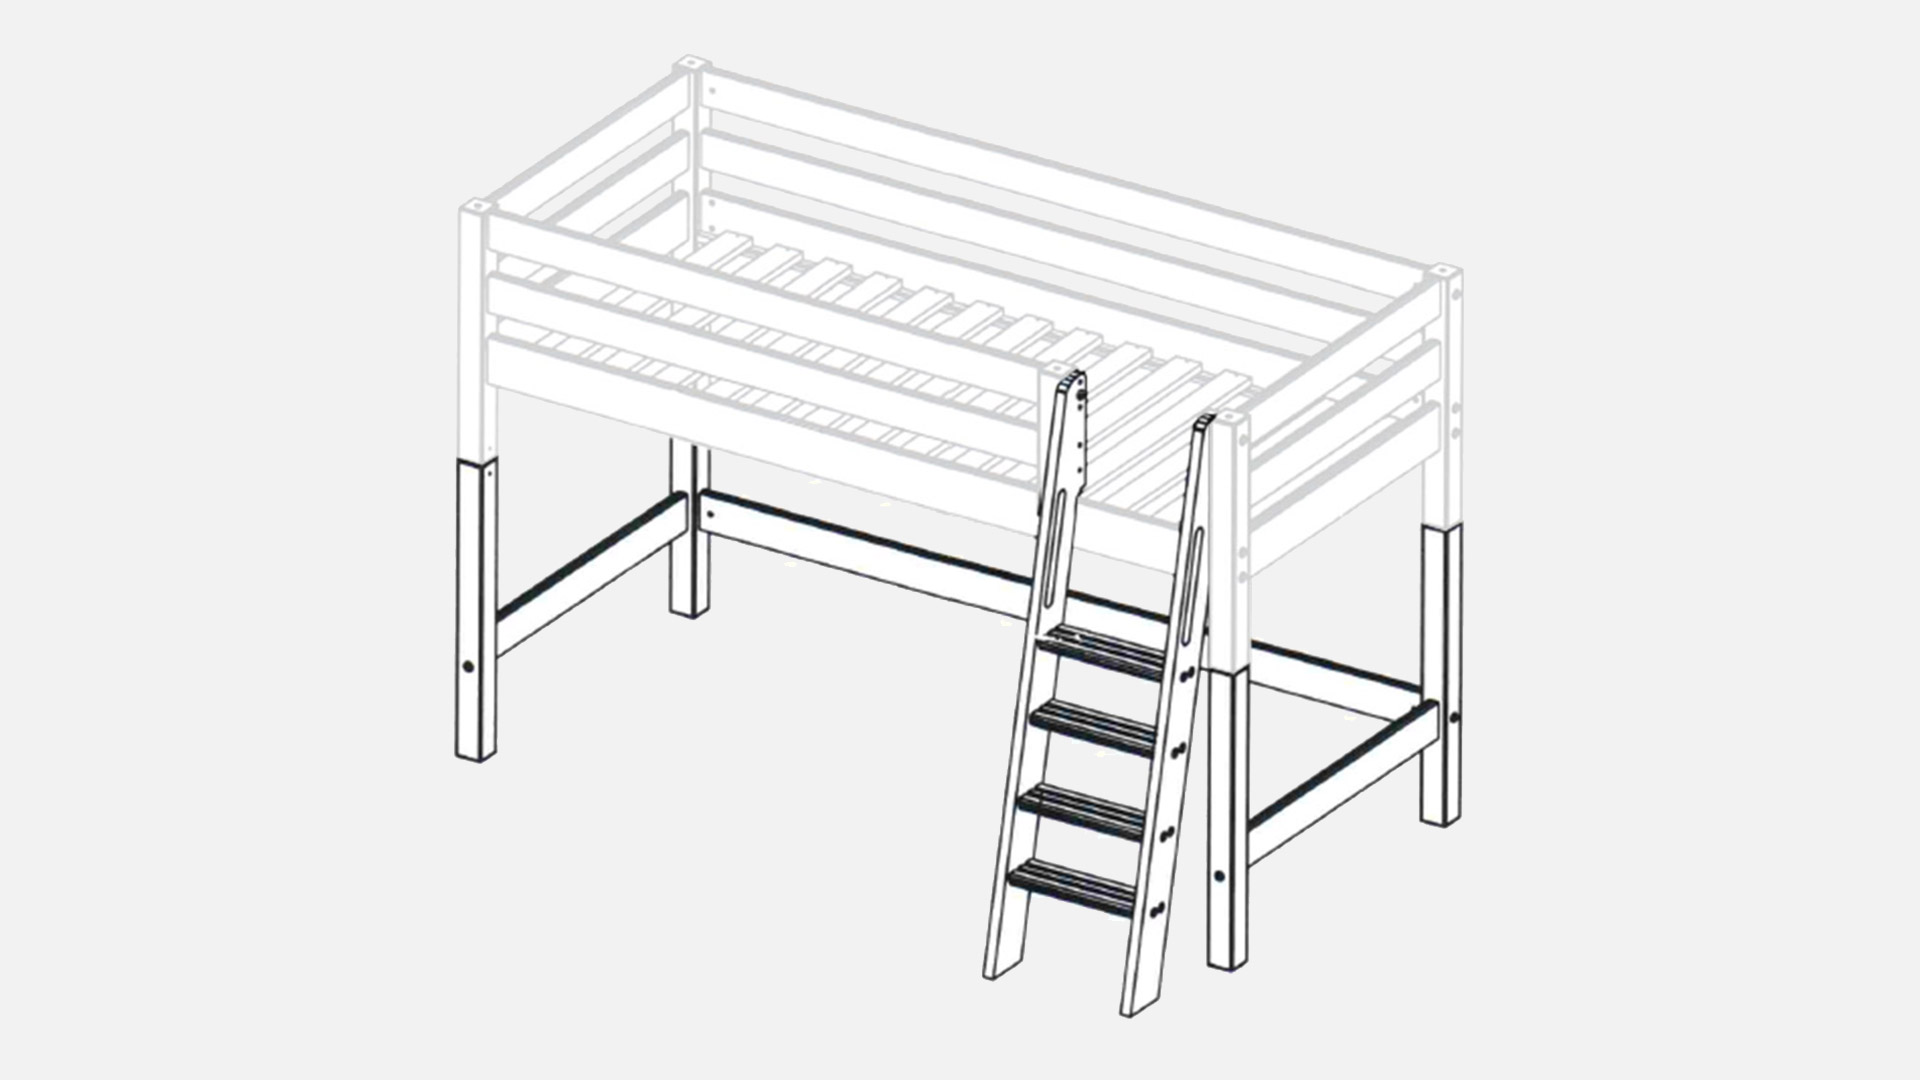 normales bett zum hochbett umbauen wohn design. Black Bedroom Furniture Sets. Home Design Ideas